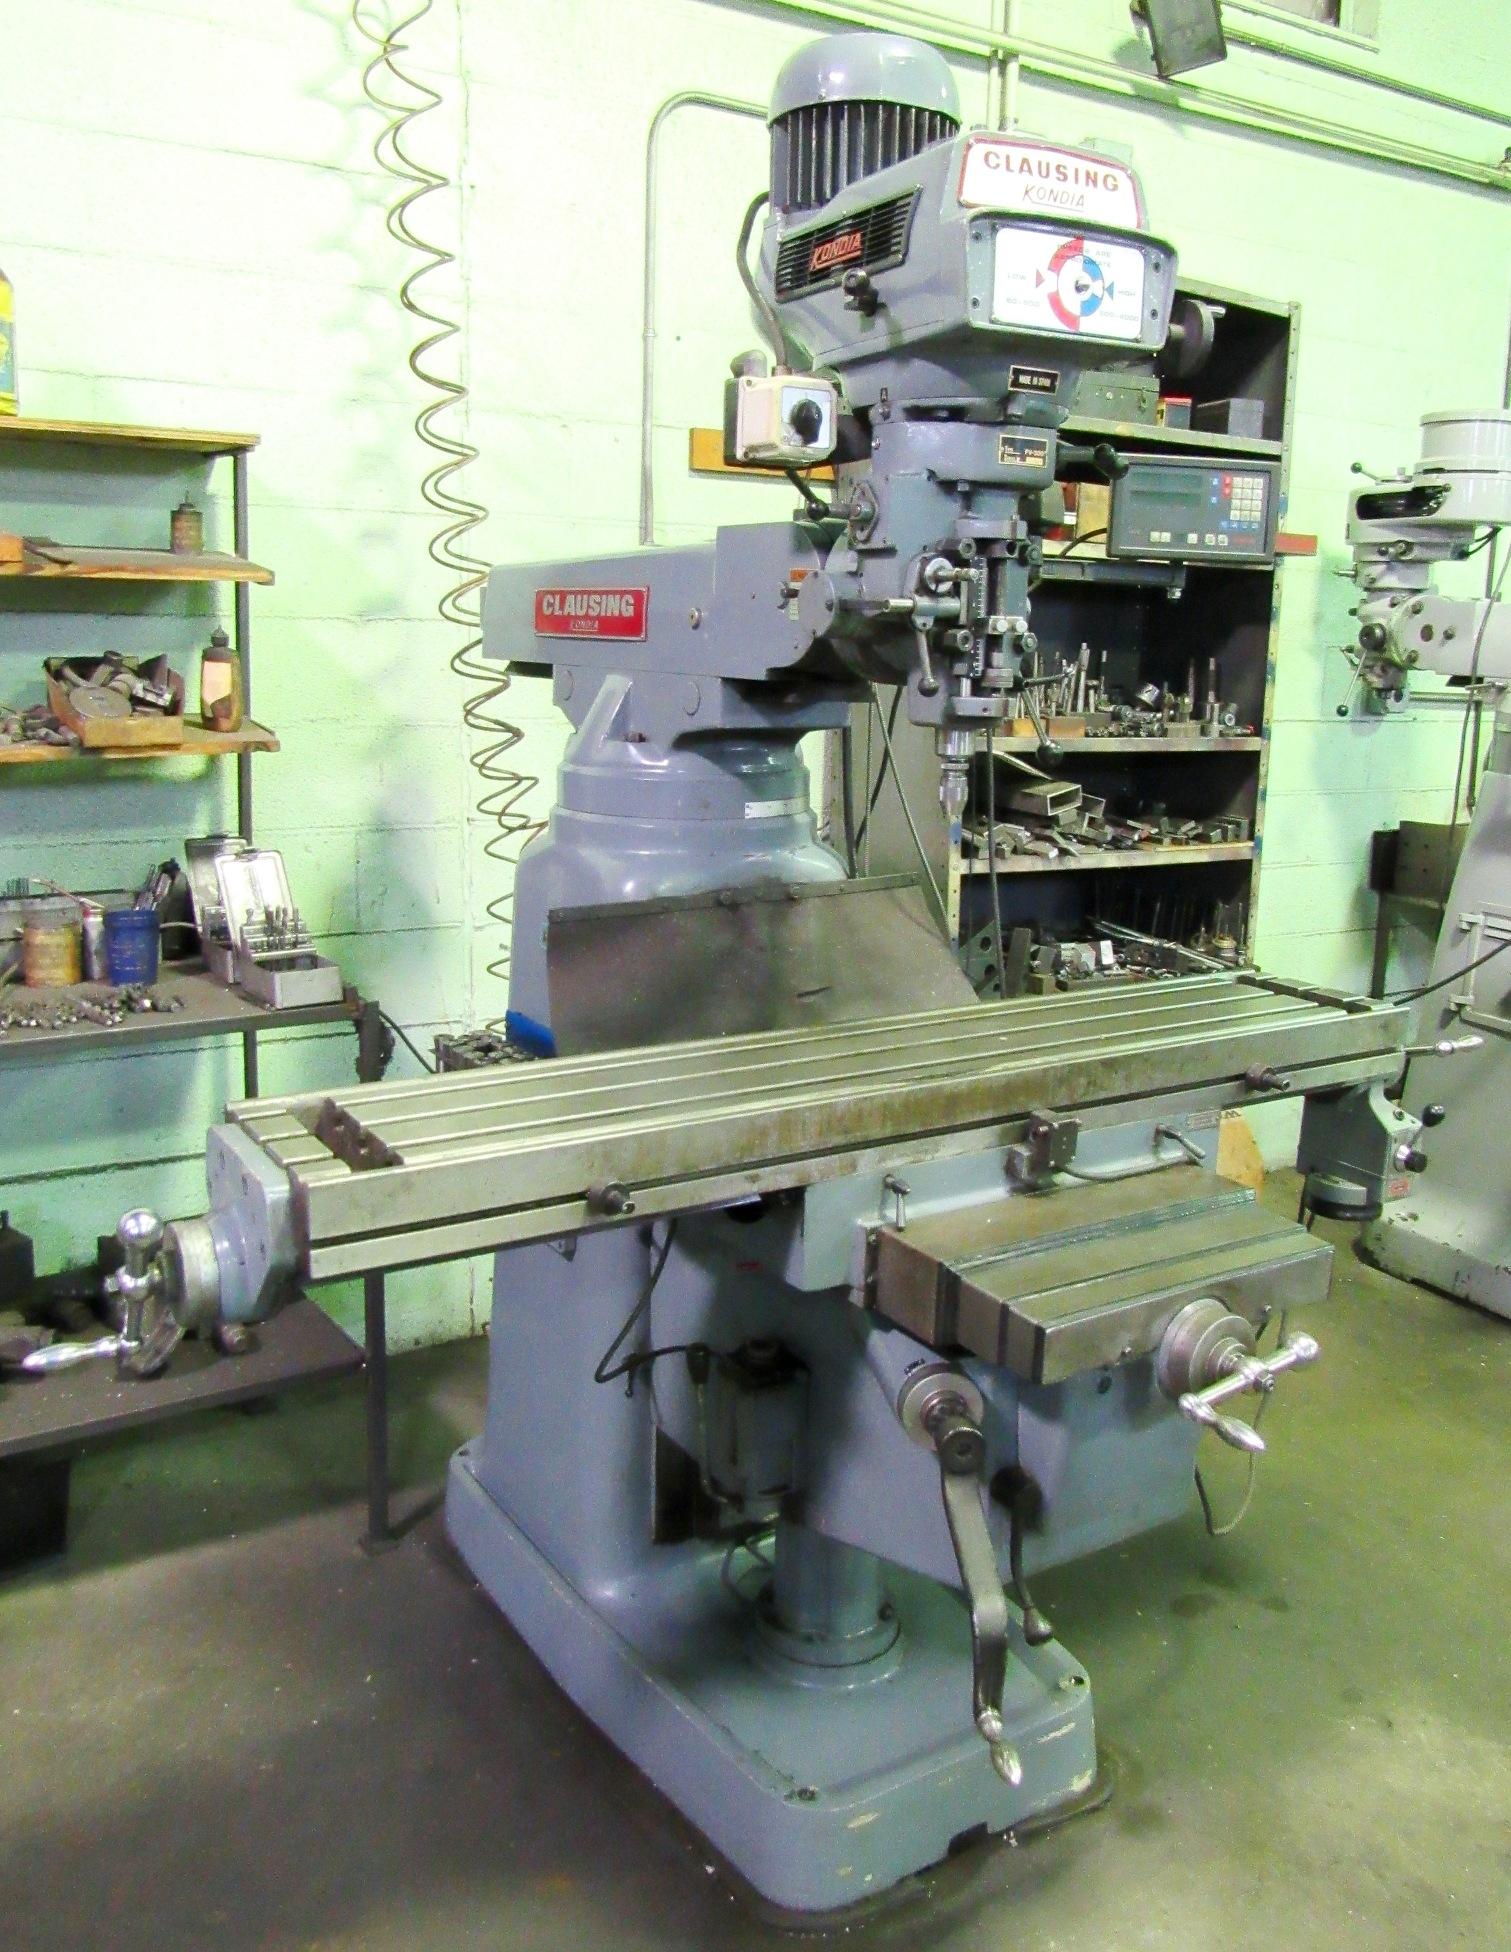 Lot 140 - Clausing Kondia Mod. FV-300 4HP Vari-Speed Milling Machine